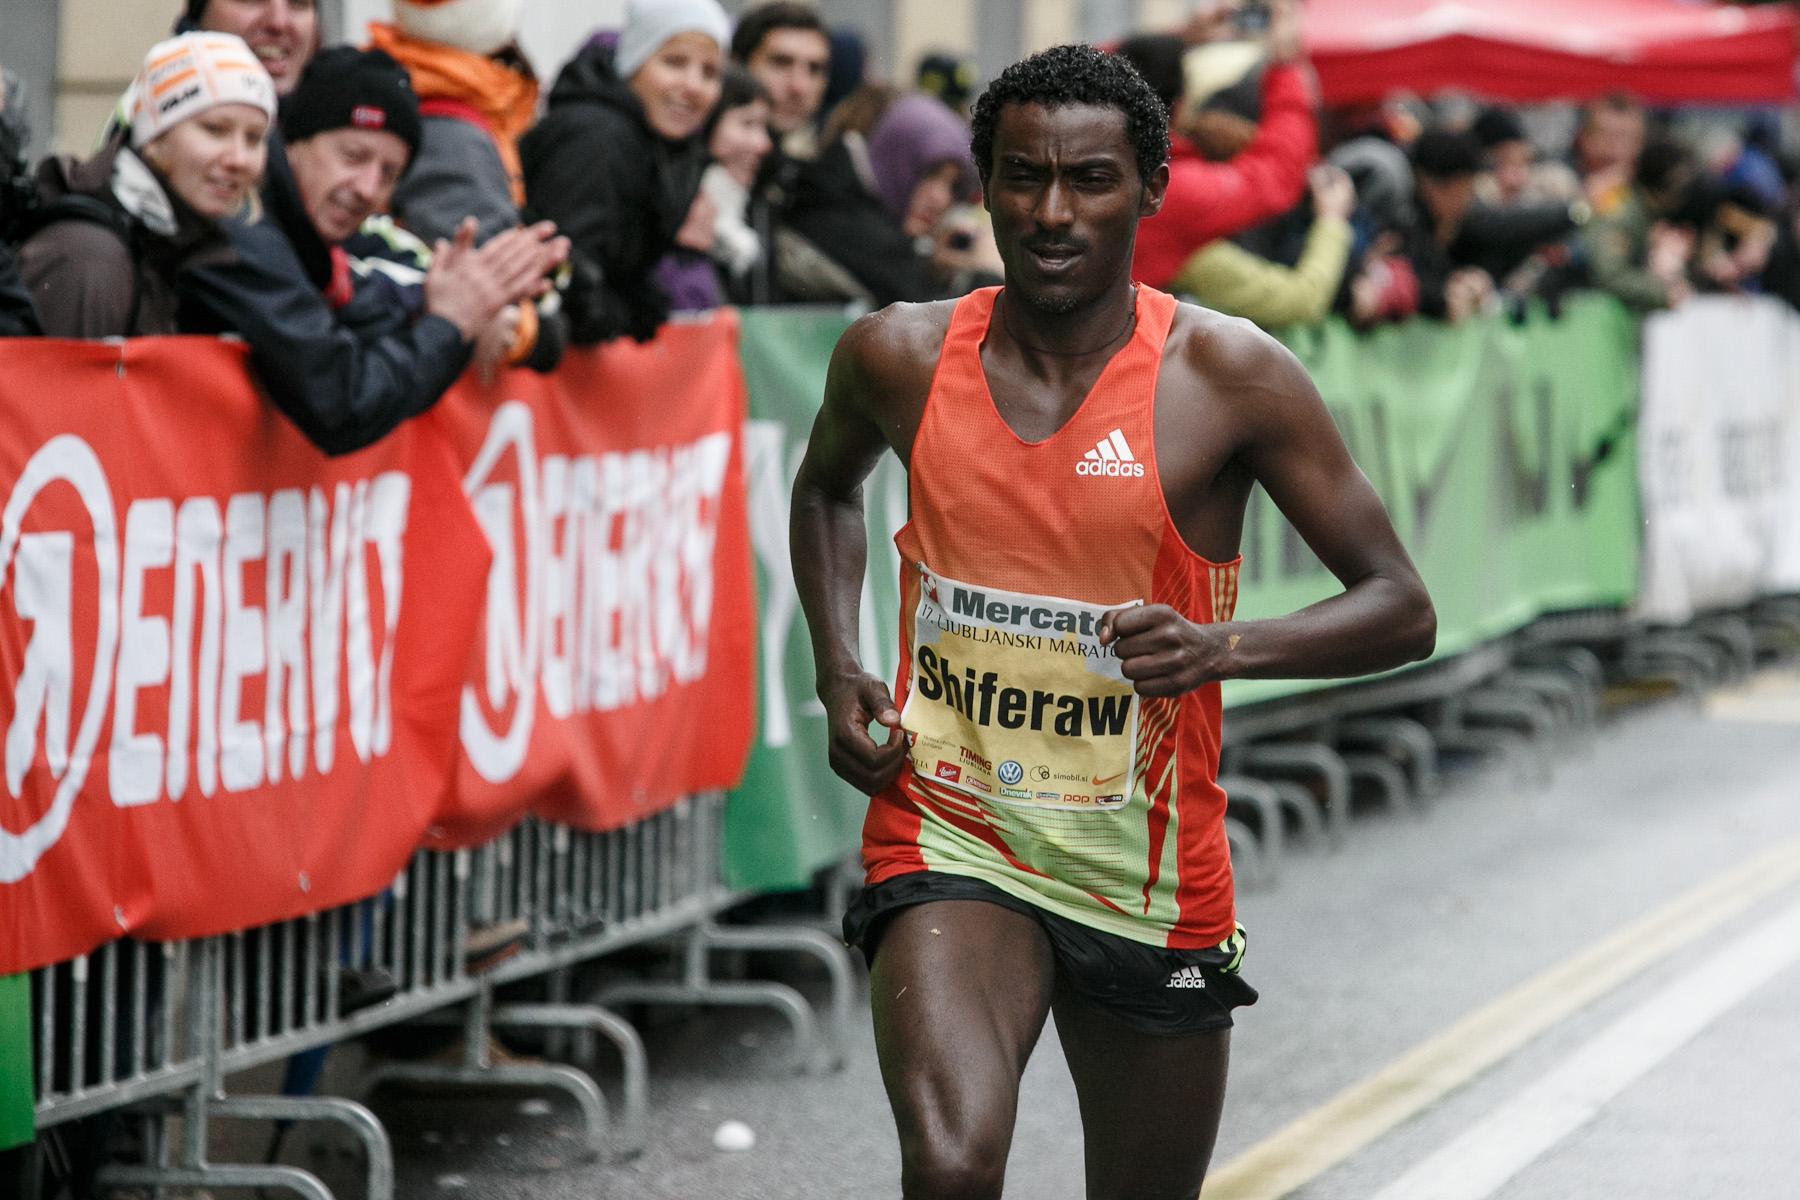 Berhanu Shiferaw of Ethiopia competes in the 17th International Ljubljana Marathon on Oct 28, 2012 in Ljubljana, Slovenia.